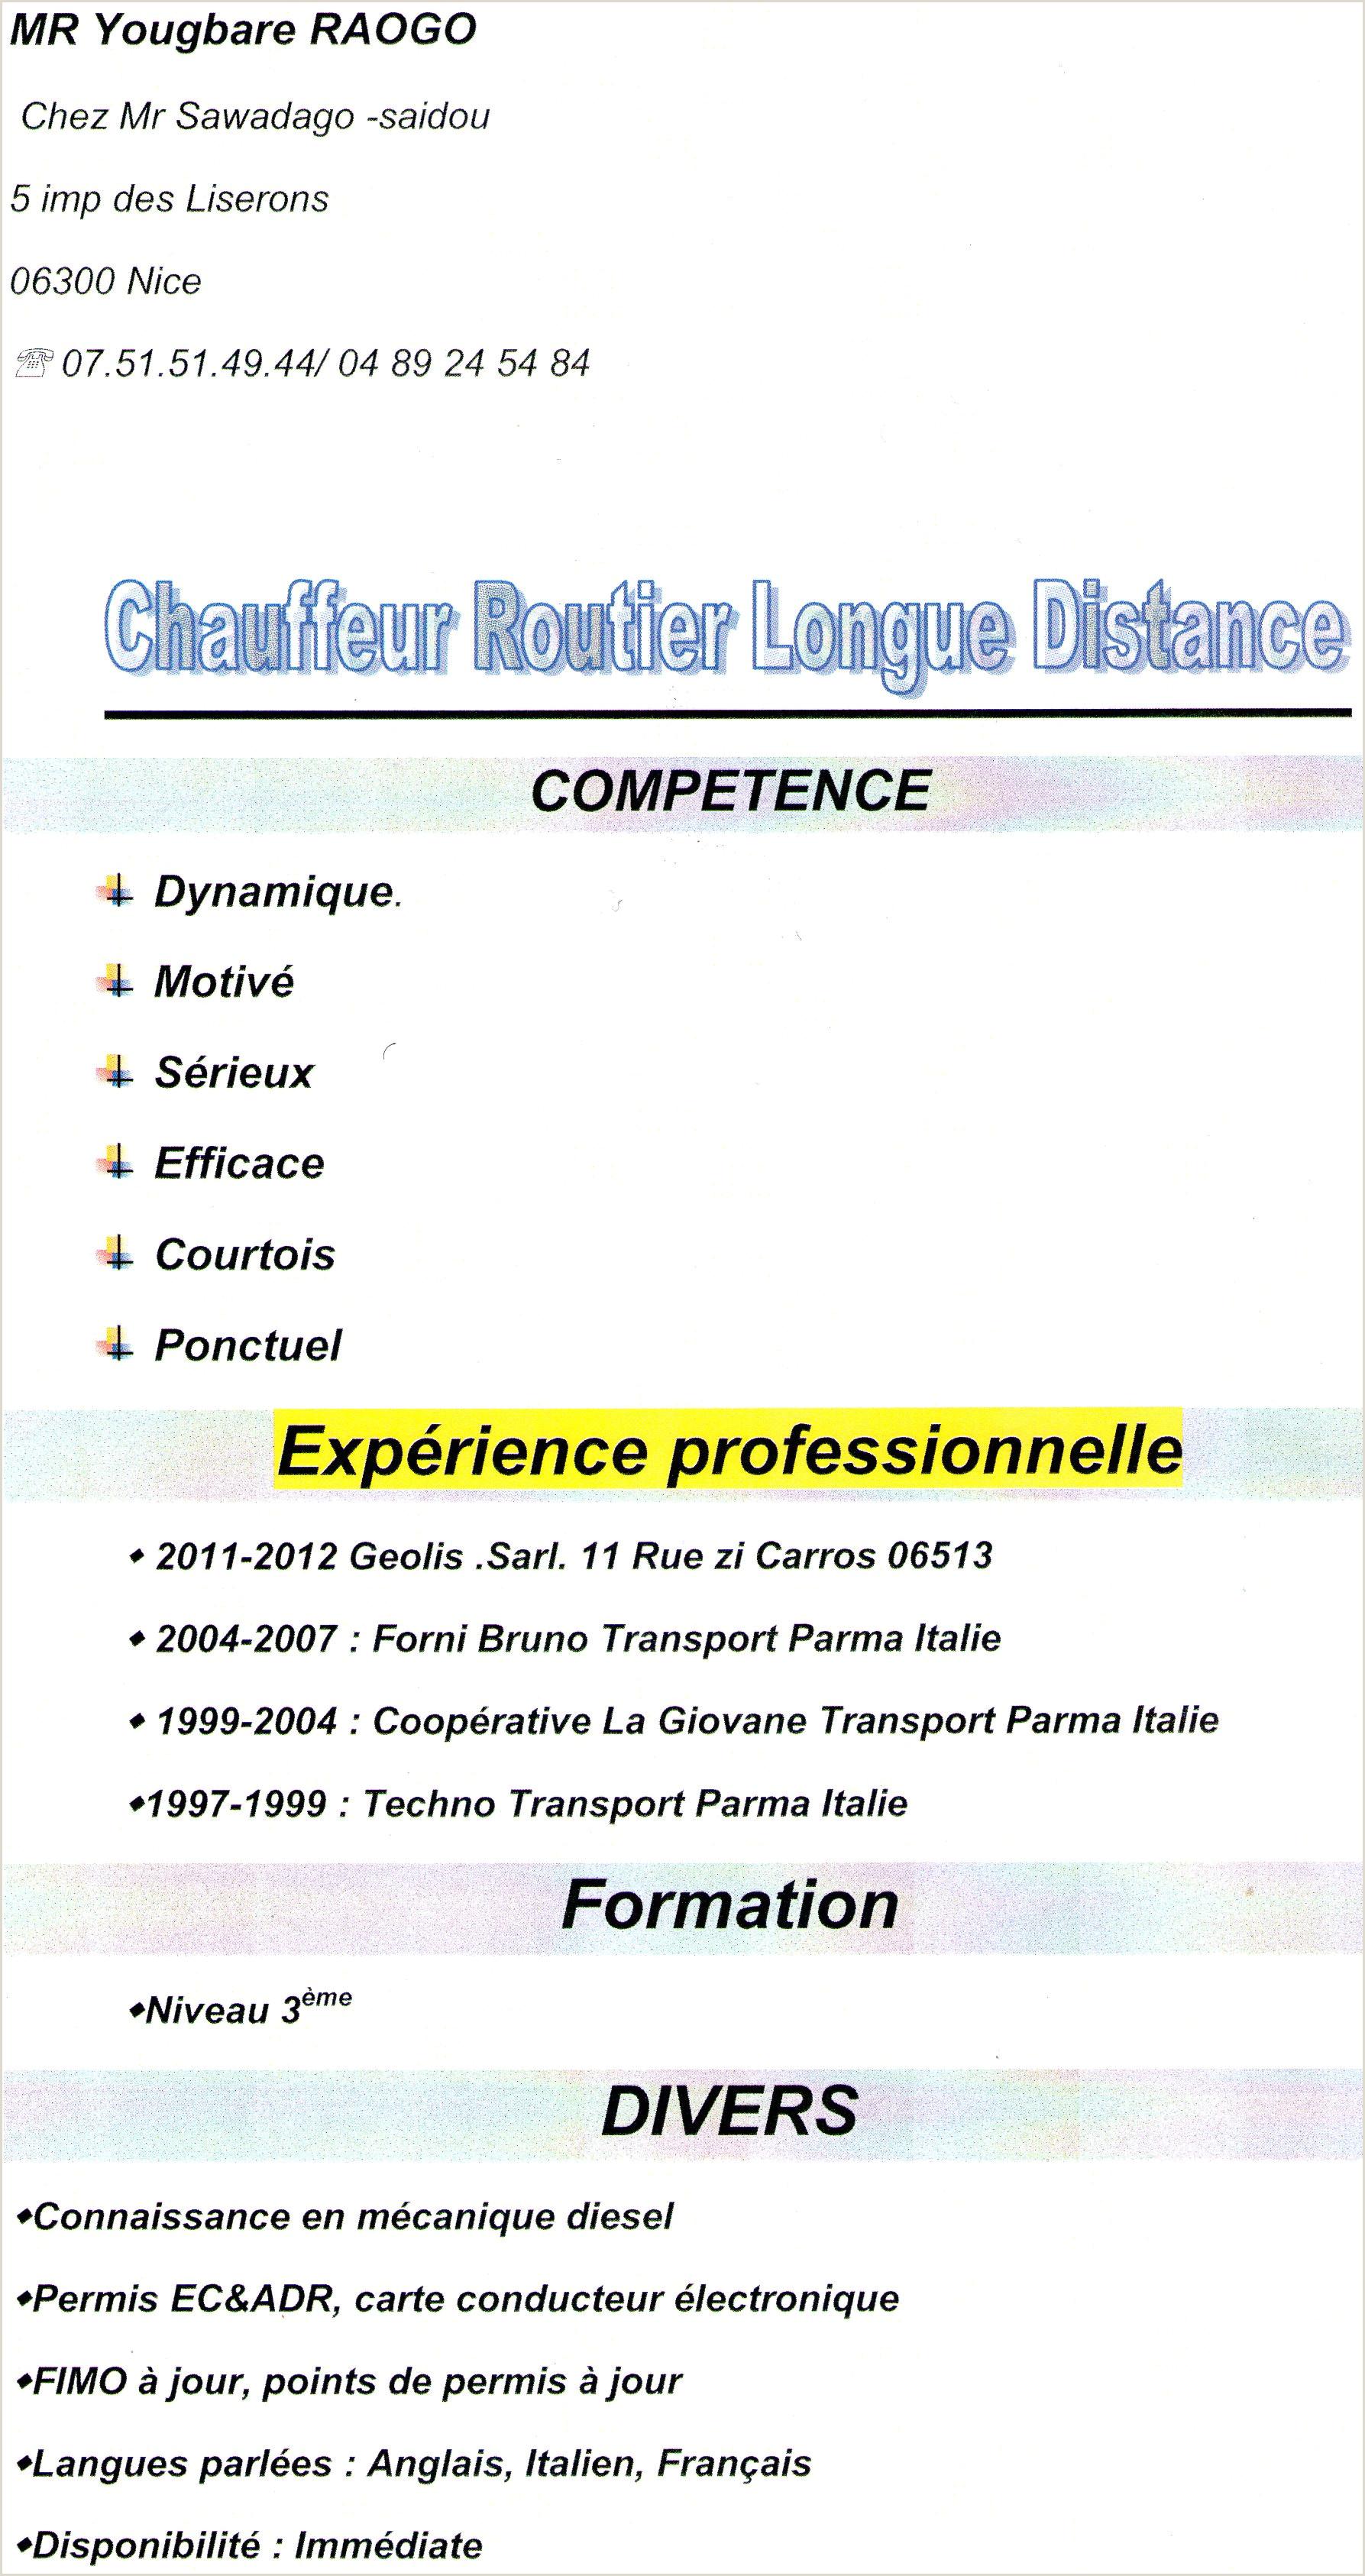 Exemple De Cv Pdf Gratuit Maroc Cv Gratuit Brancar R